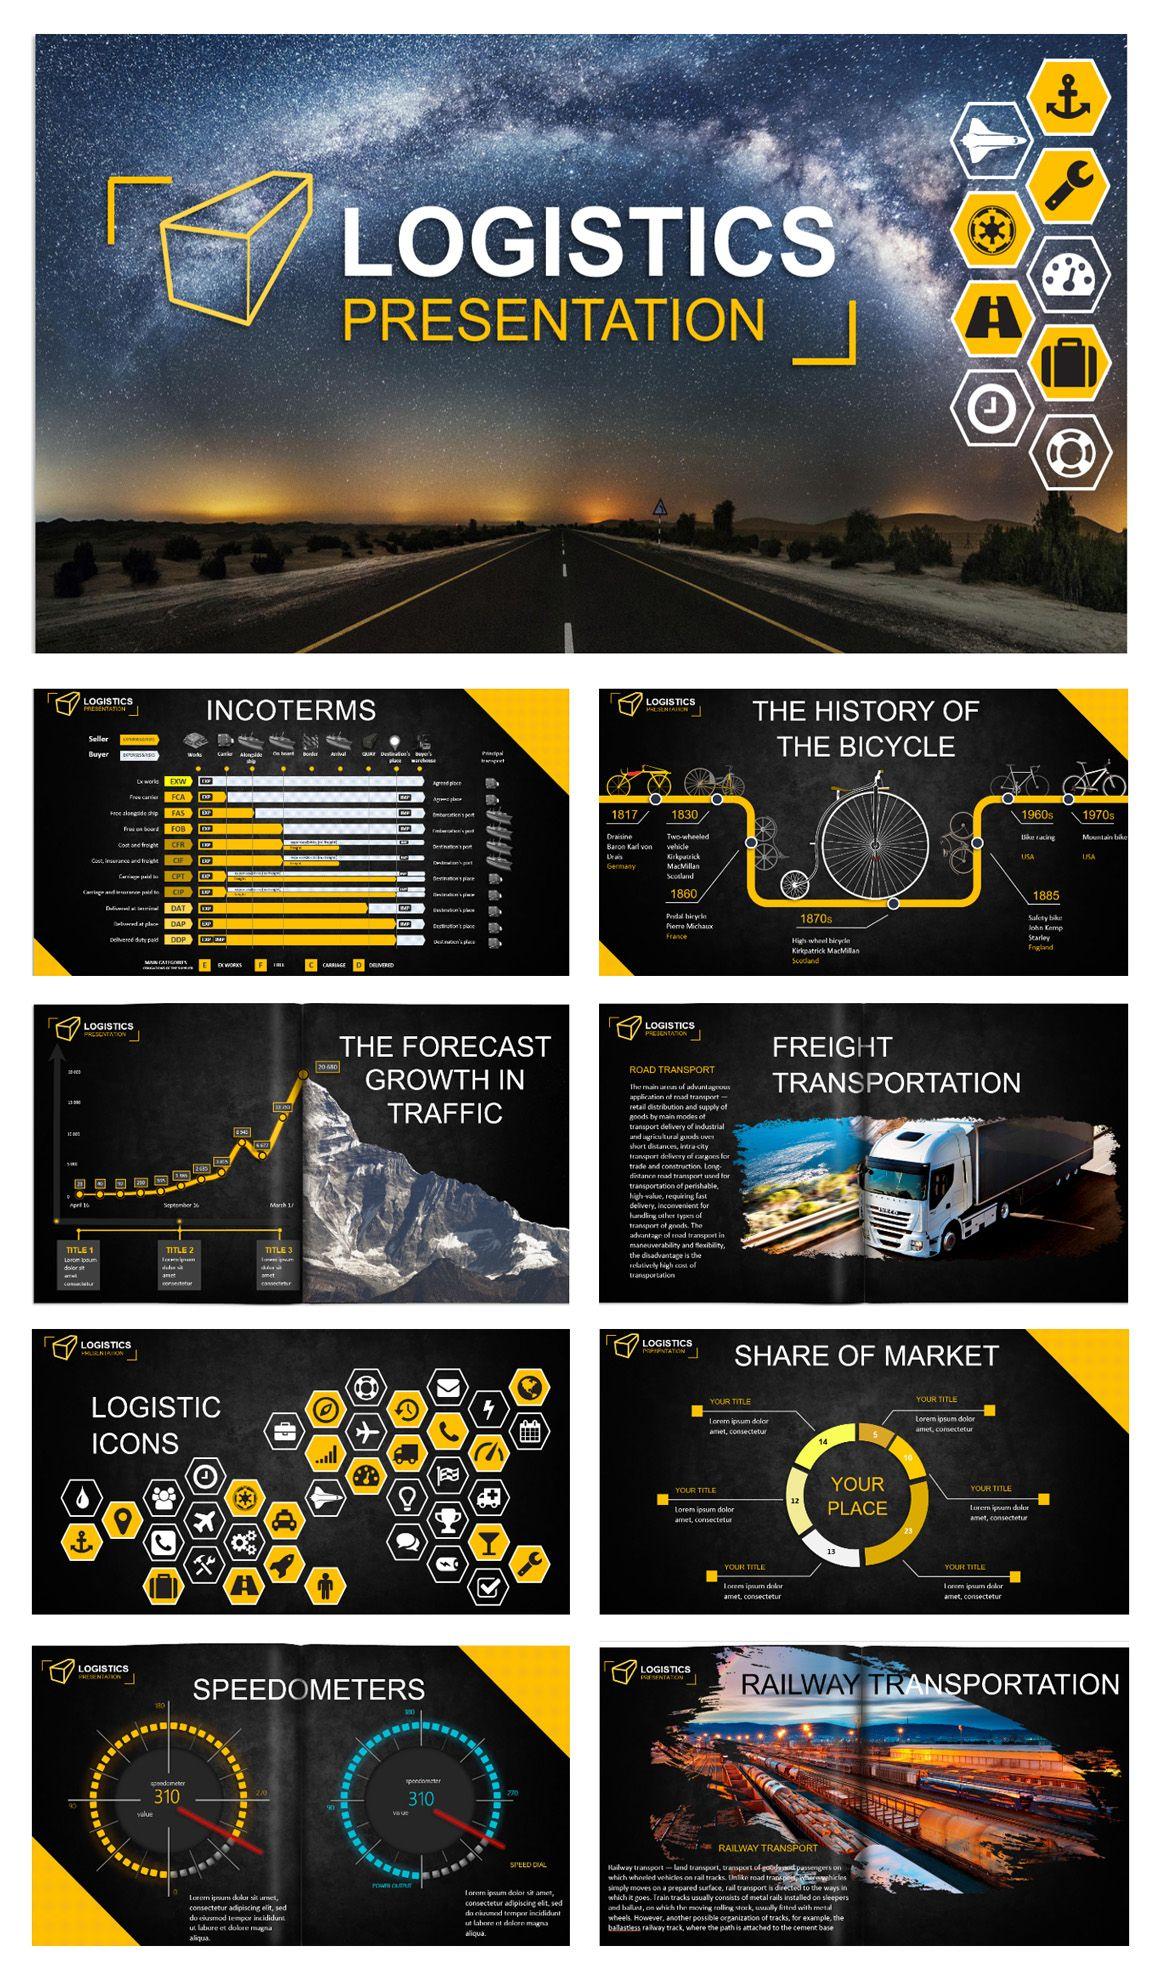 Logistics Powerpoint Template By Creative Art Studio On